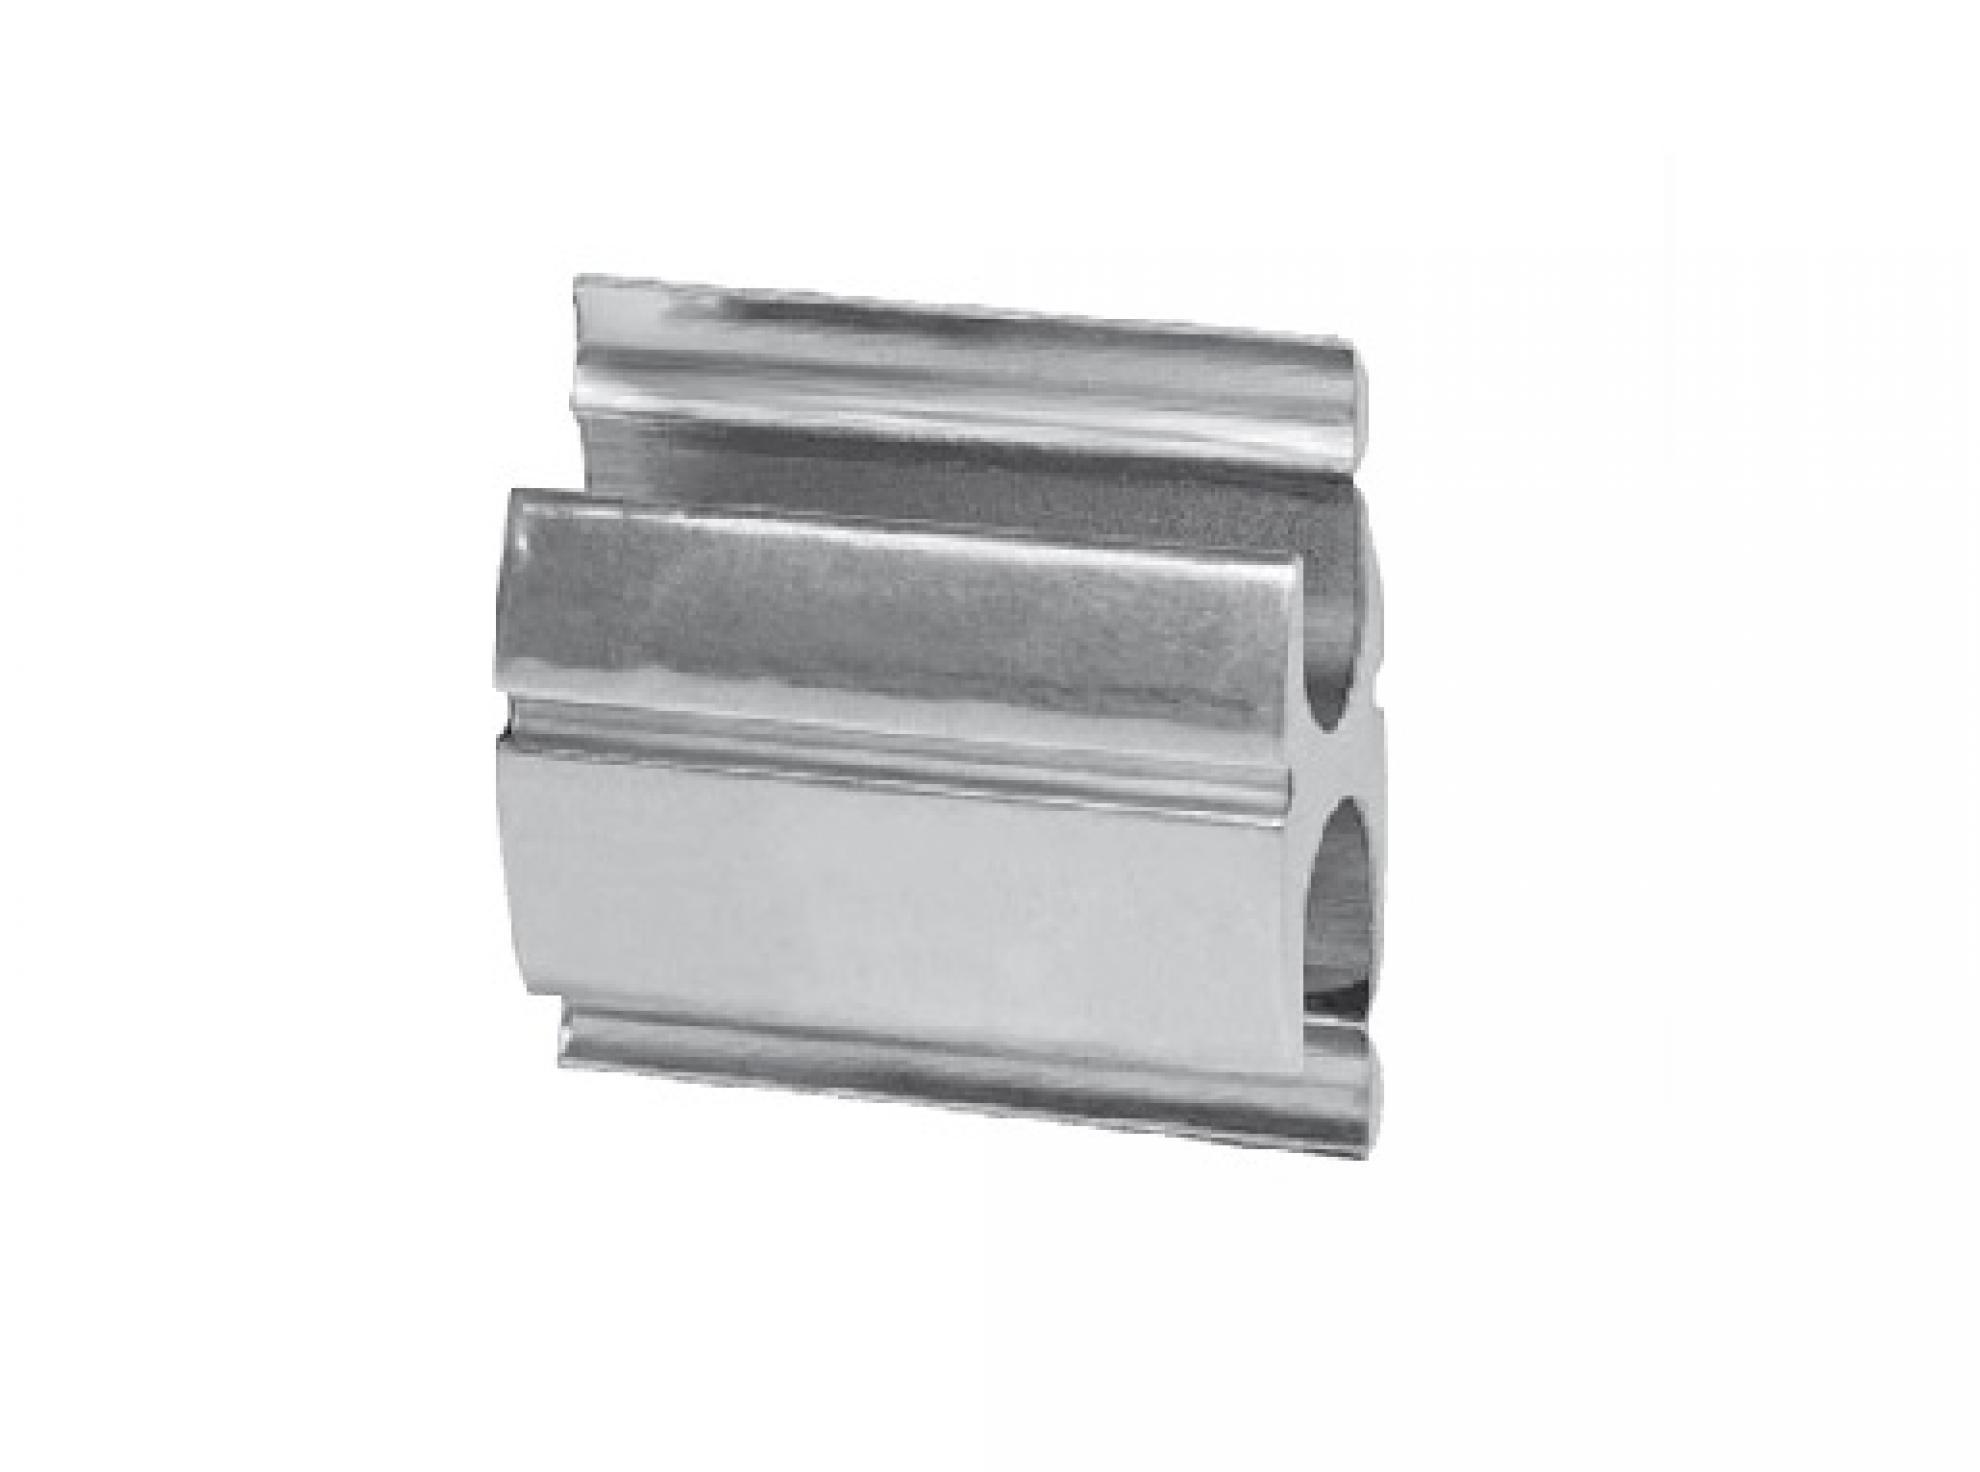 Conector de compress�o - Cah-120 a 70